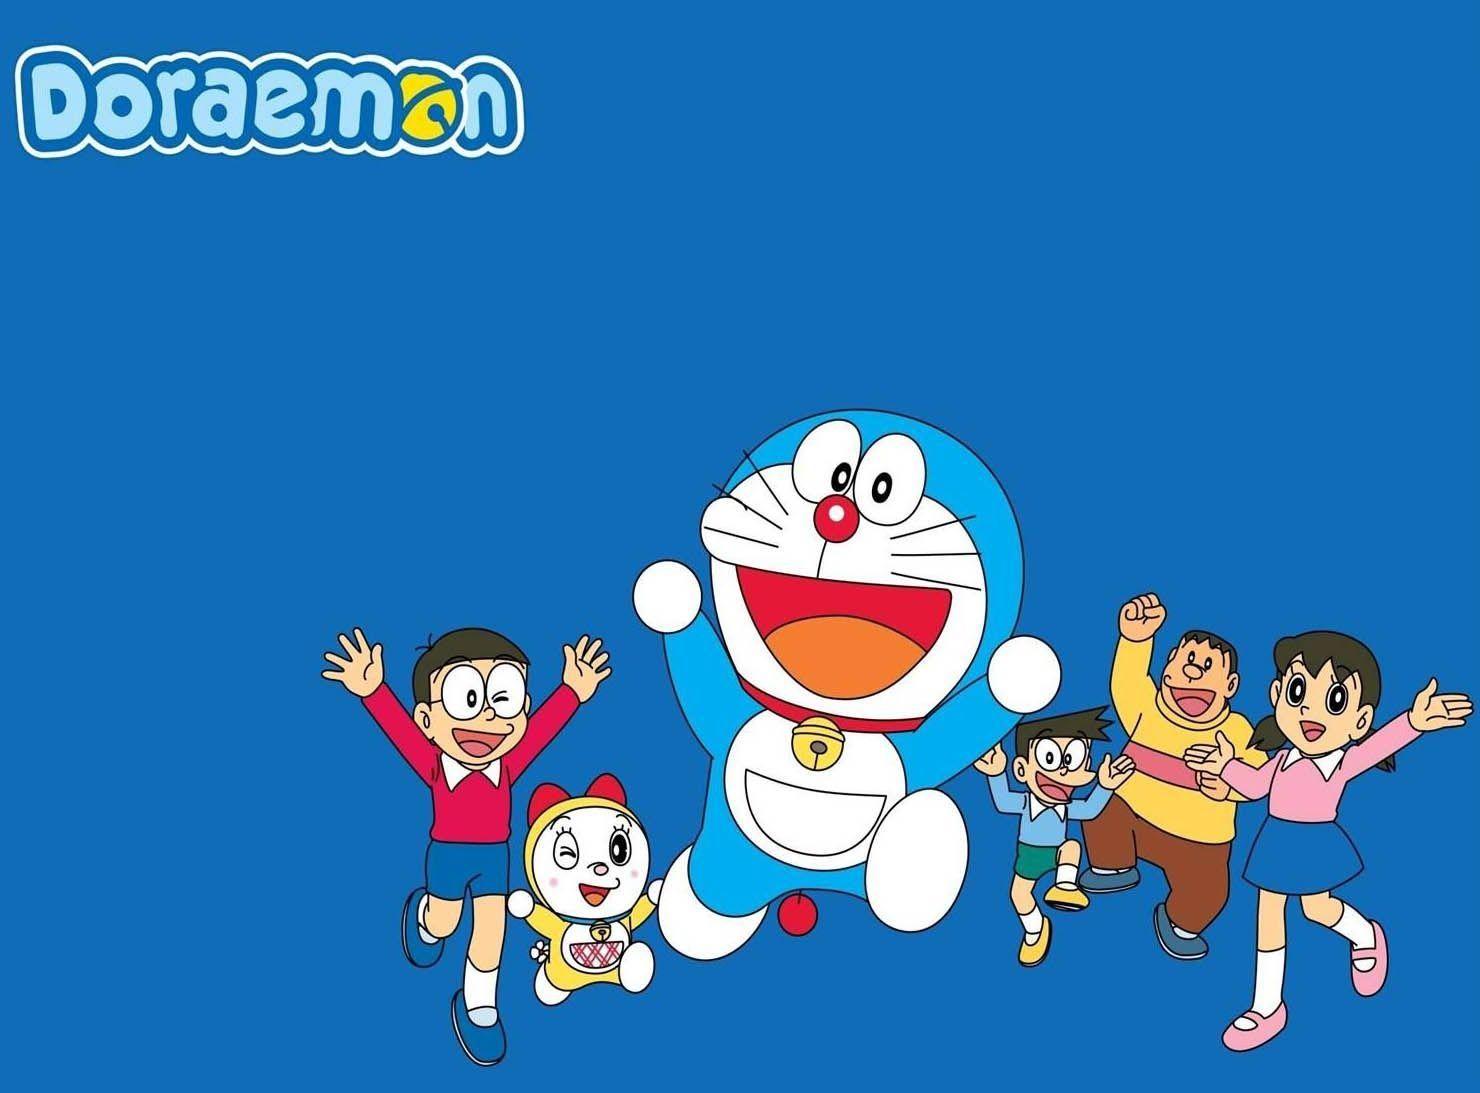 Doraemon Cartoons Images Cartoon wallpaper hd, Hd